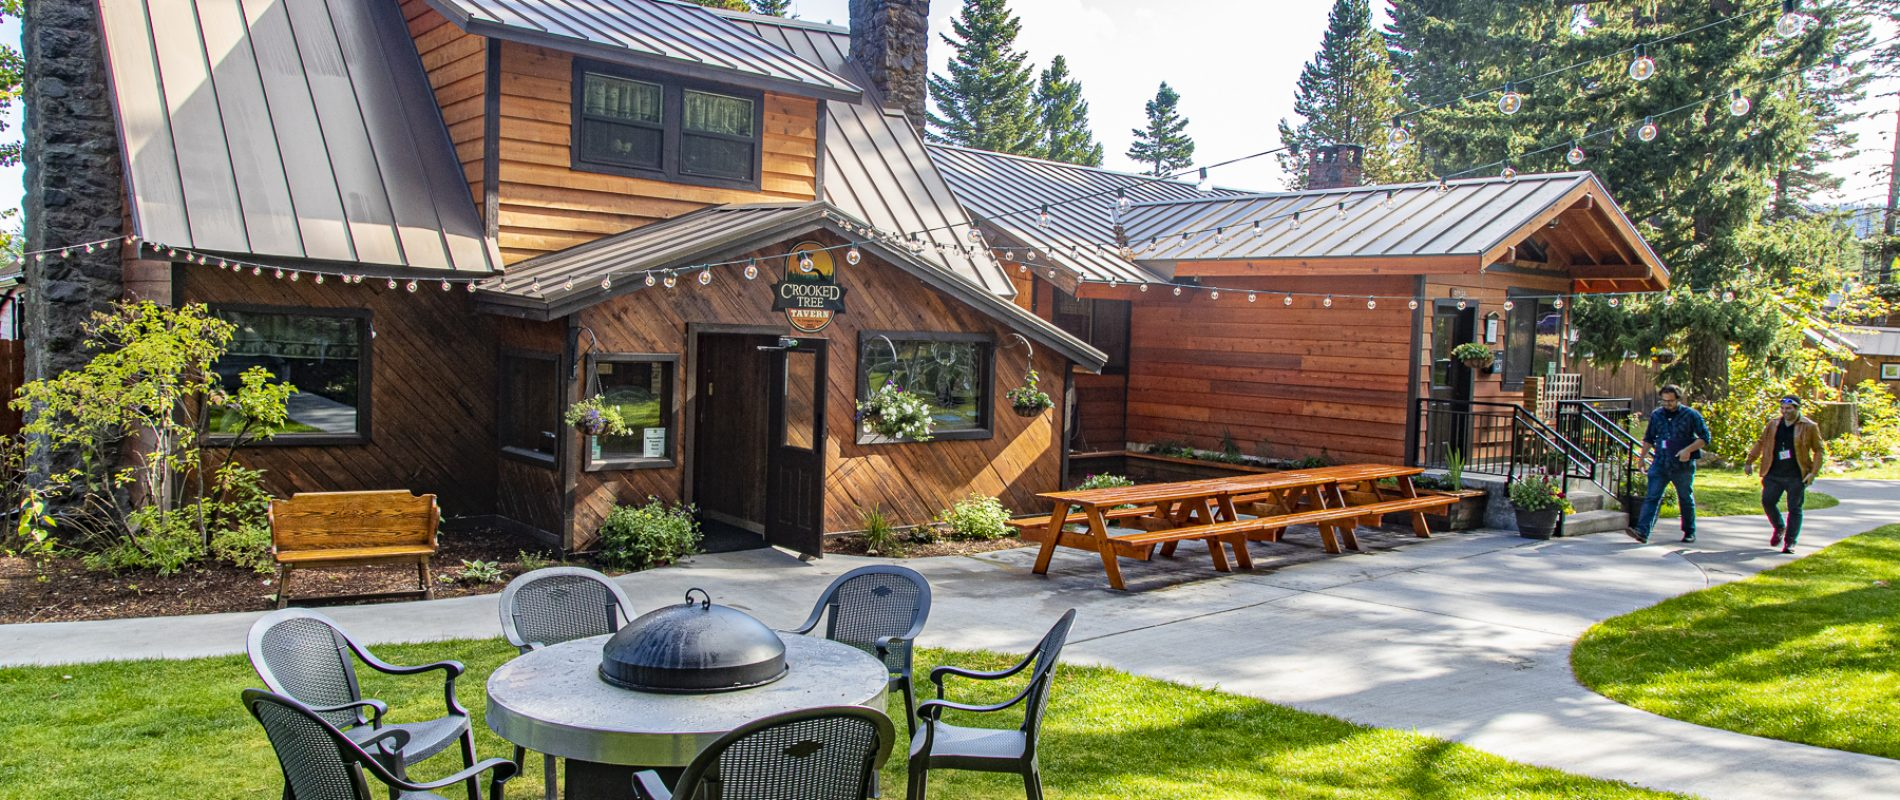 Crooked Tree Tavern at Cooper Spur Mountain Resort on Mount Hood- Amenities